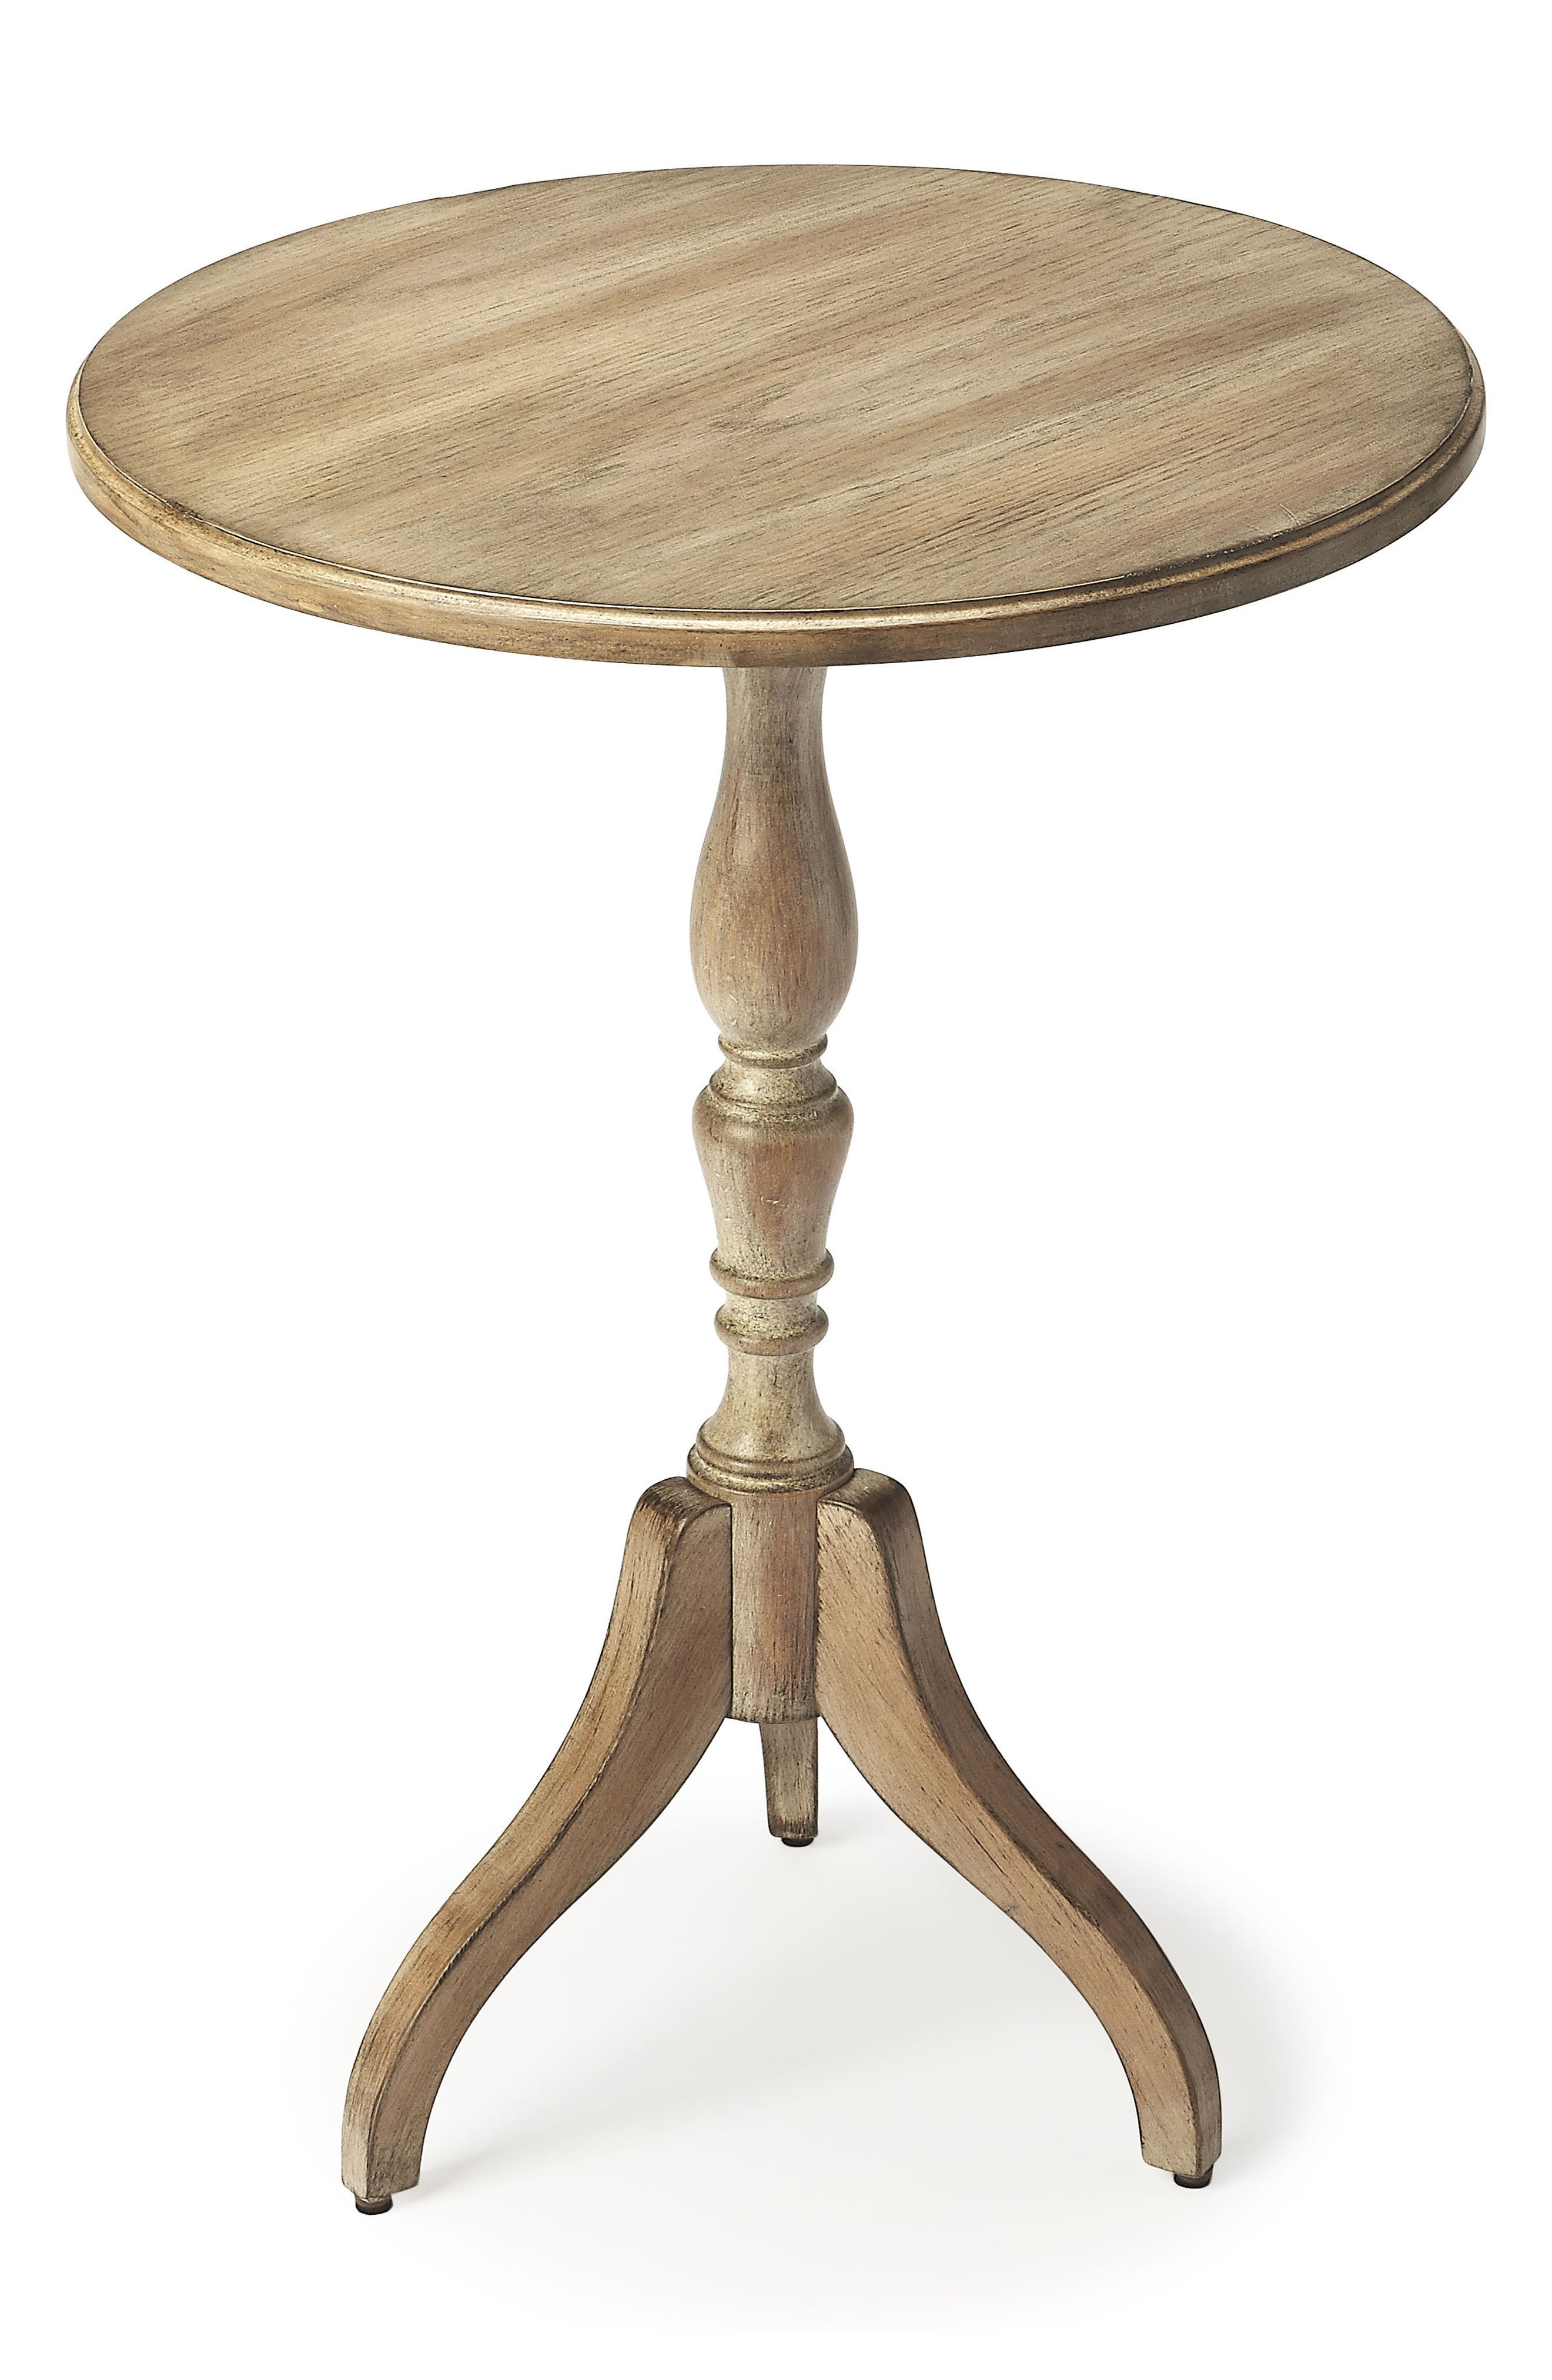 Wood Pedestal Table,                             Main thumbnail 1, color,                             020